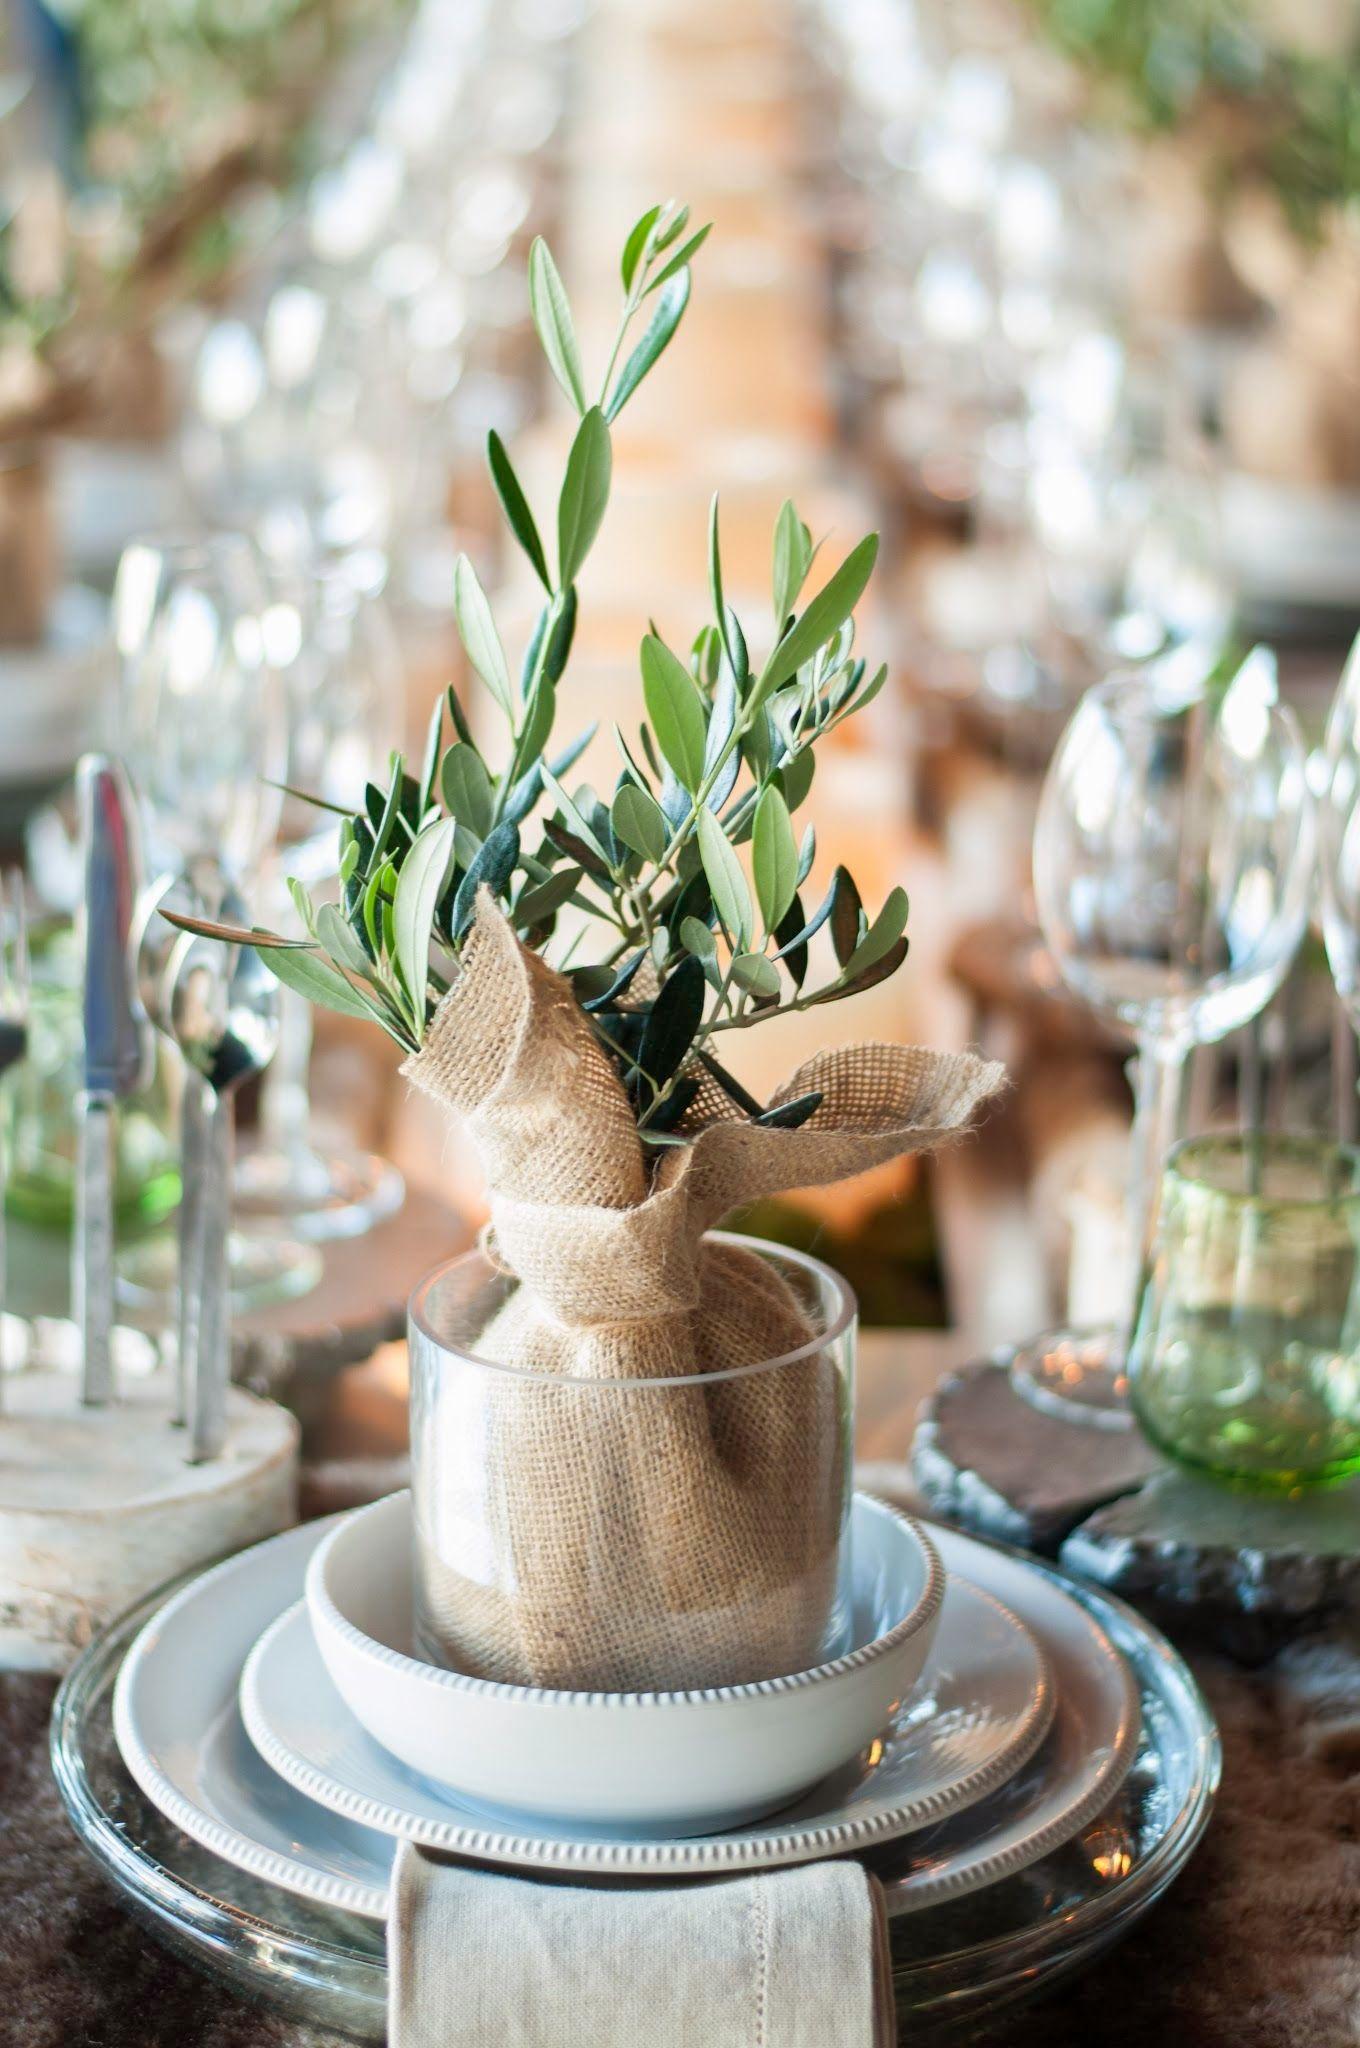 diffa dining by design table home i gedeckter tisch pinterest gedeckter tisch oliven und. Black Bedroom Furniture Sets. Home Design Ideas